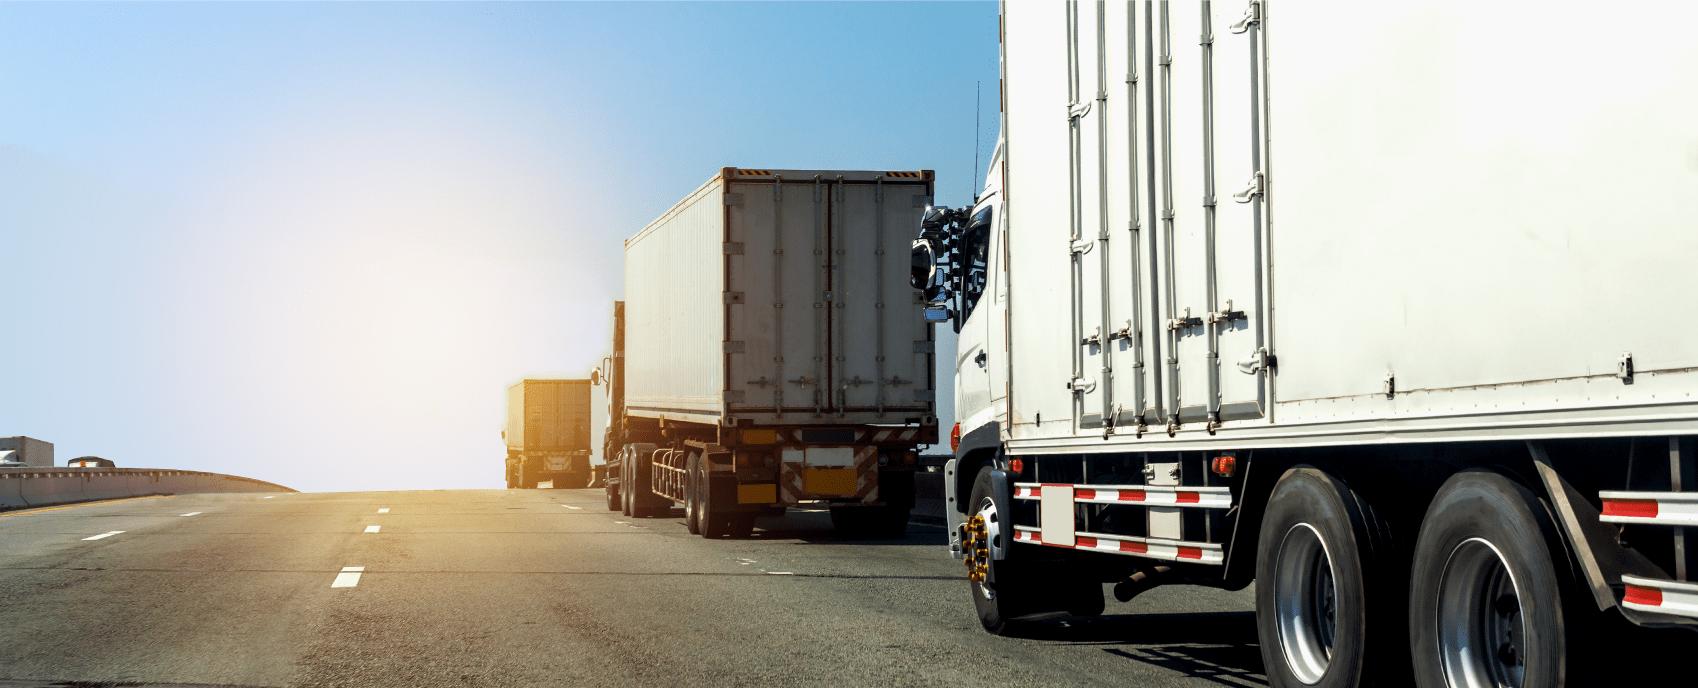 Transportation of packaged goods (FTL\LTL)